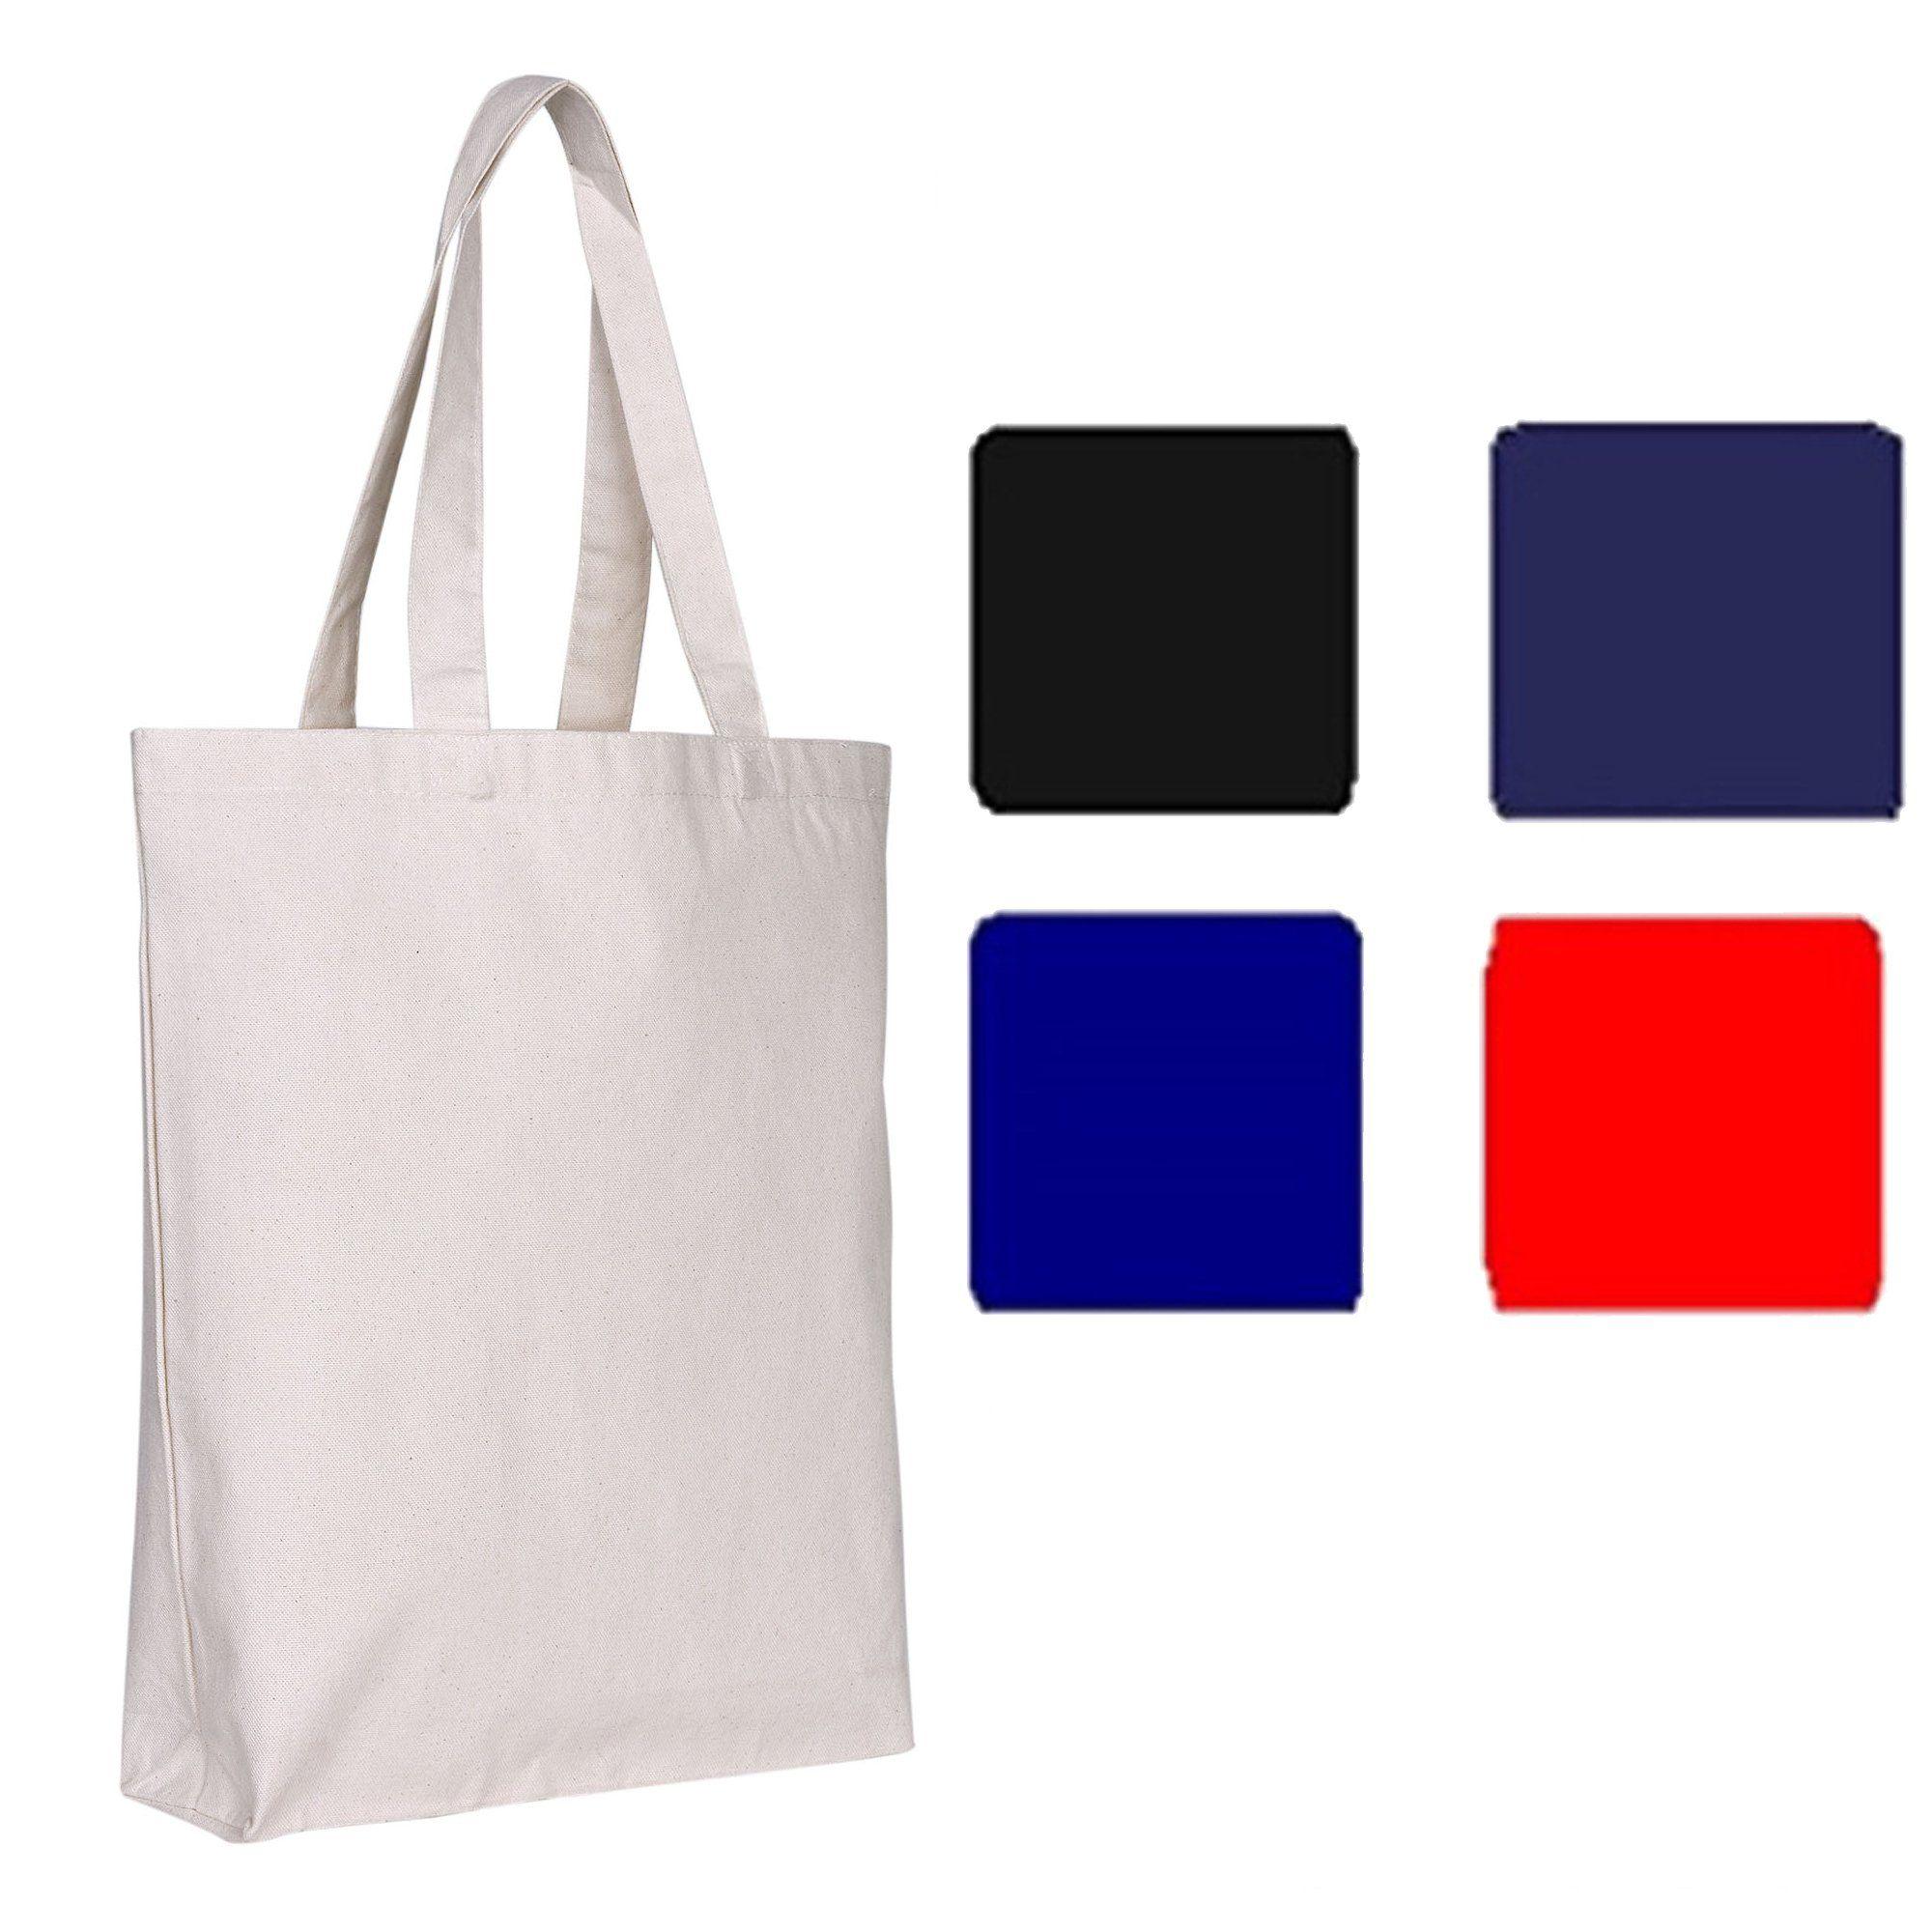 92f04a6ea7a Canvas Tote Bags Bulk - Blank Canvas Bags w/ Bottom Gusset | TG200 ...